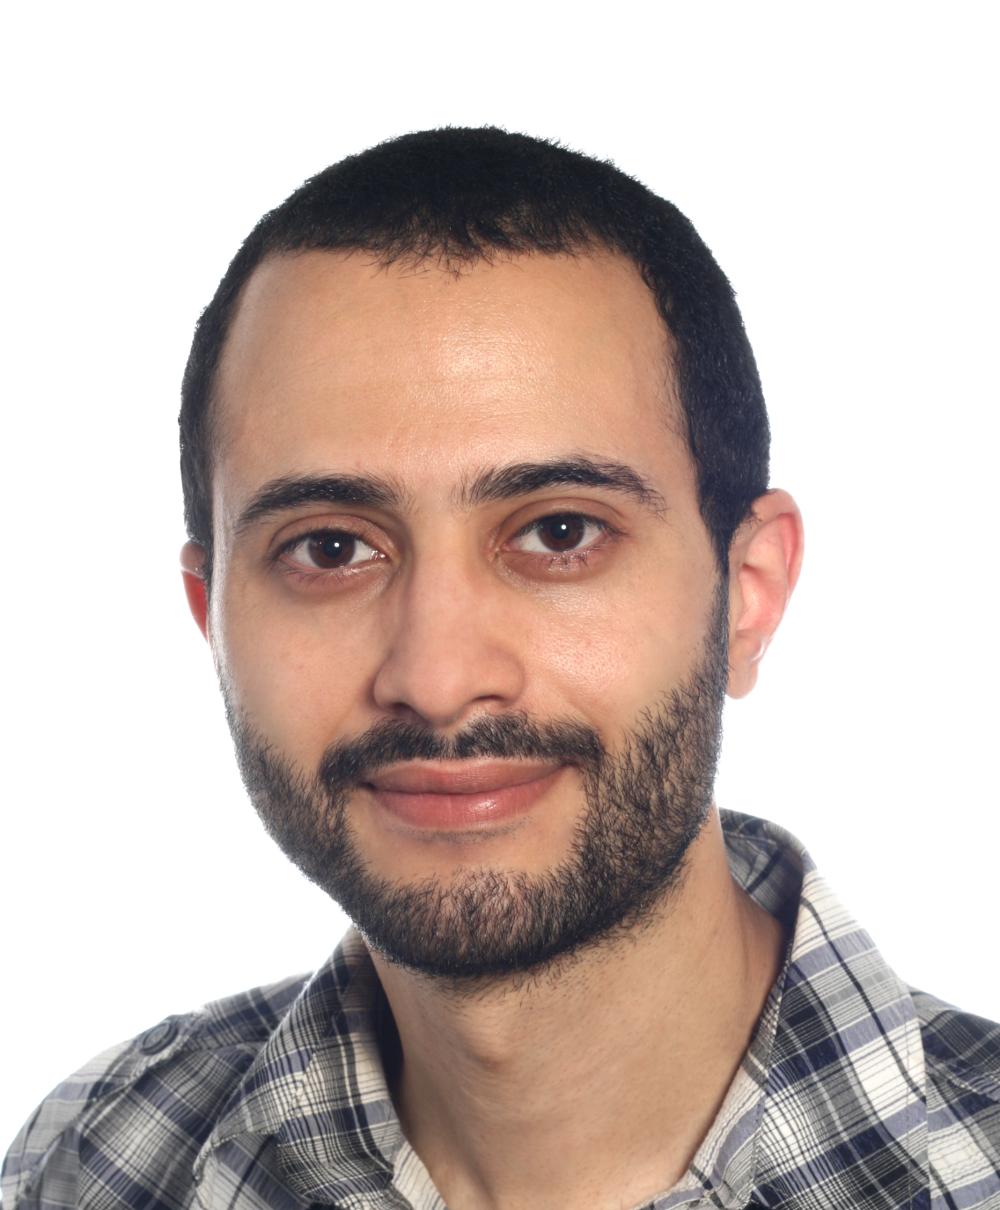 Atef Gharsalli